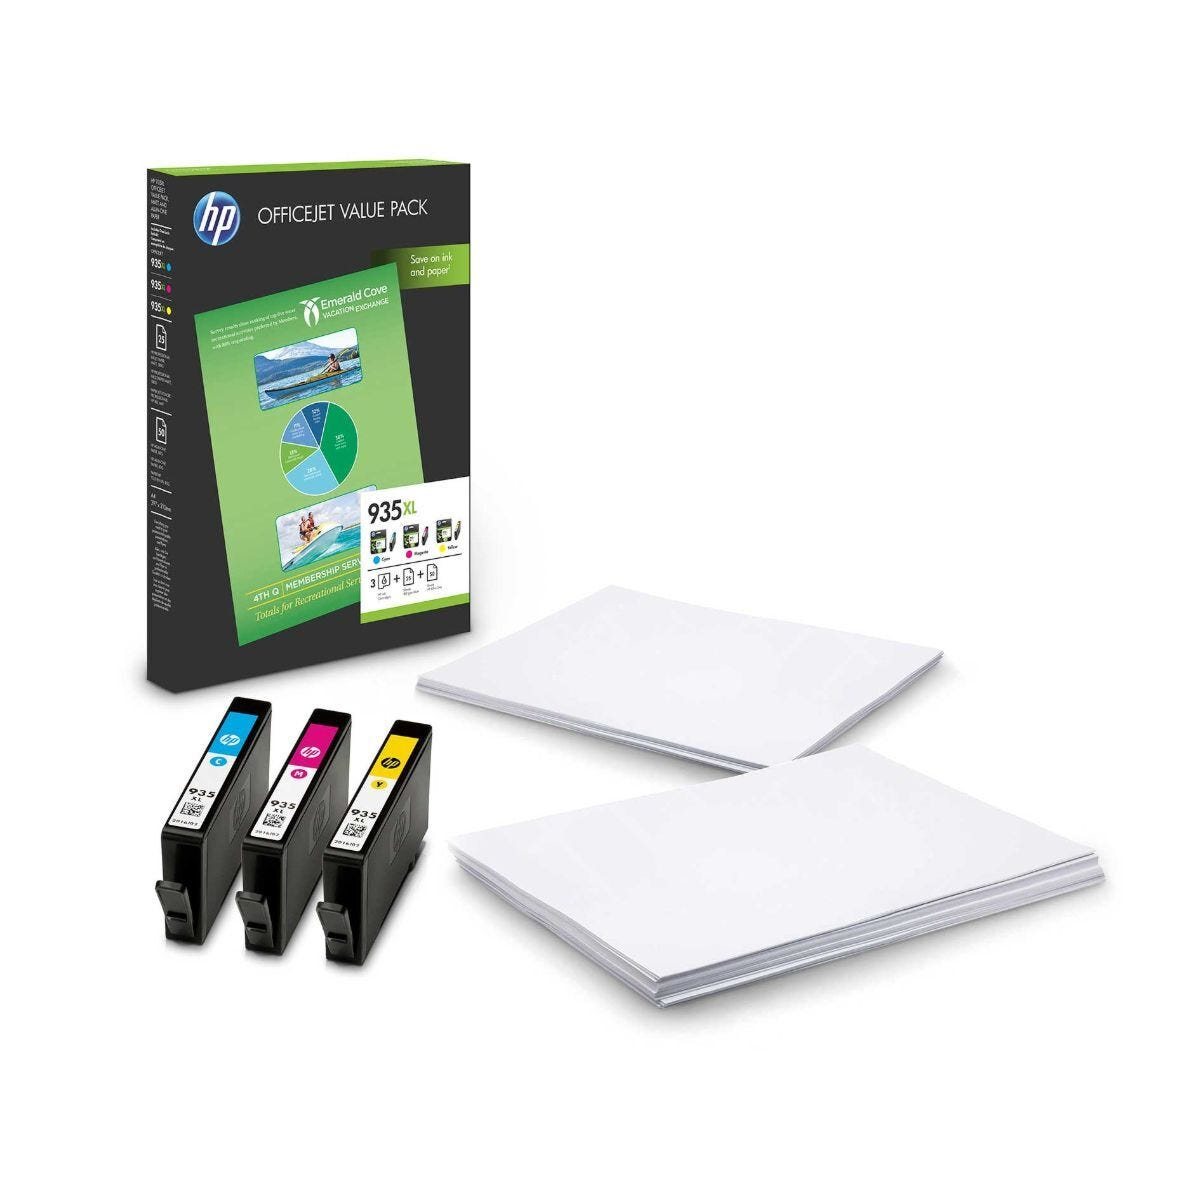 HP 935XL CMY Ink Cartridge OfficeJet Value Pack